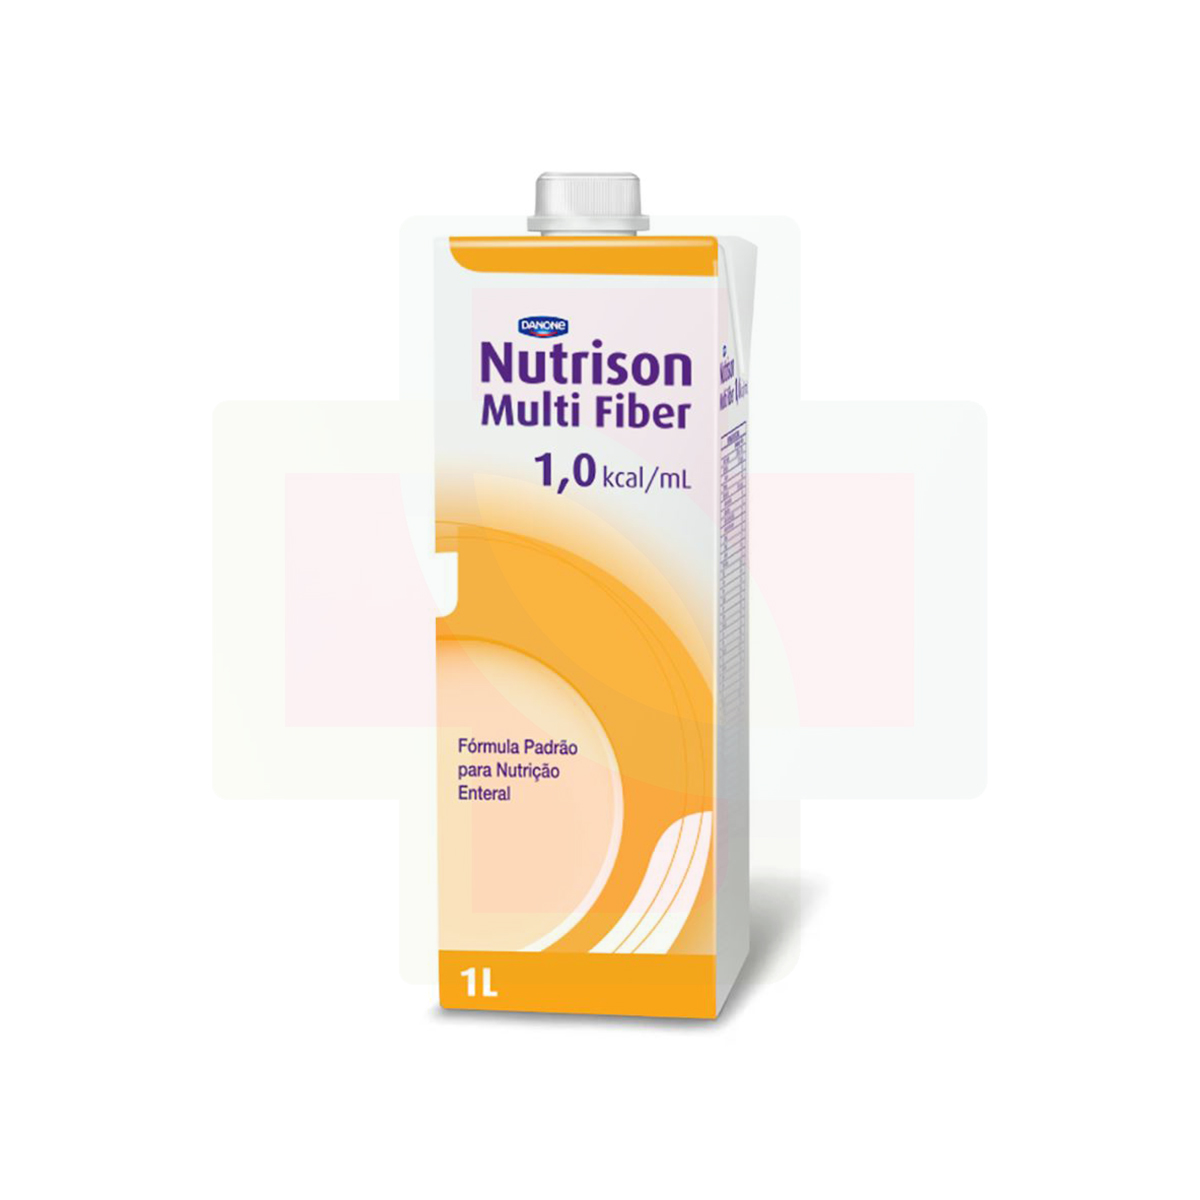 NUTRISON MULTI FIBER 1.0 KCAL/ML 1 LT SEM SABOR - DANONE ENTERAL